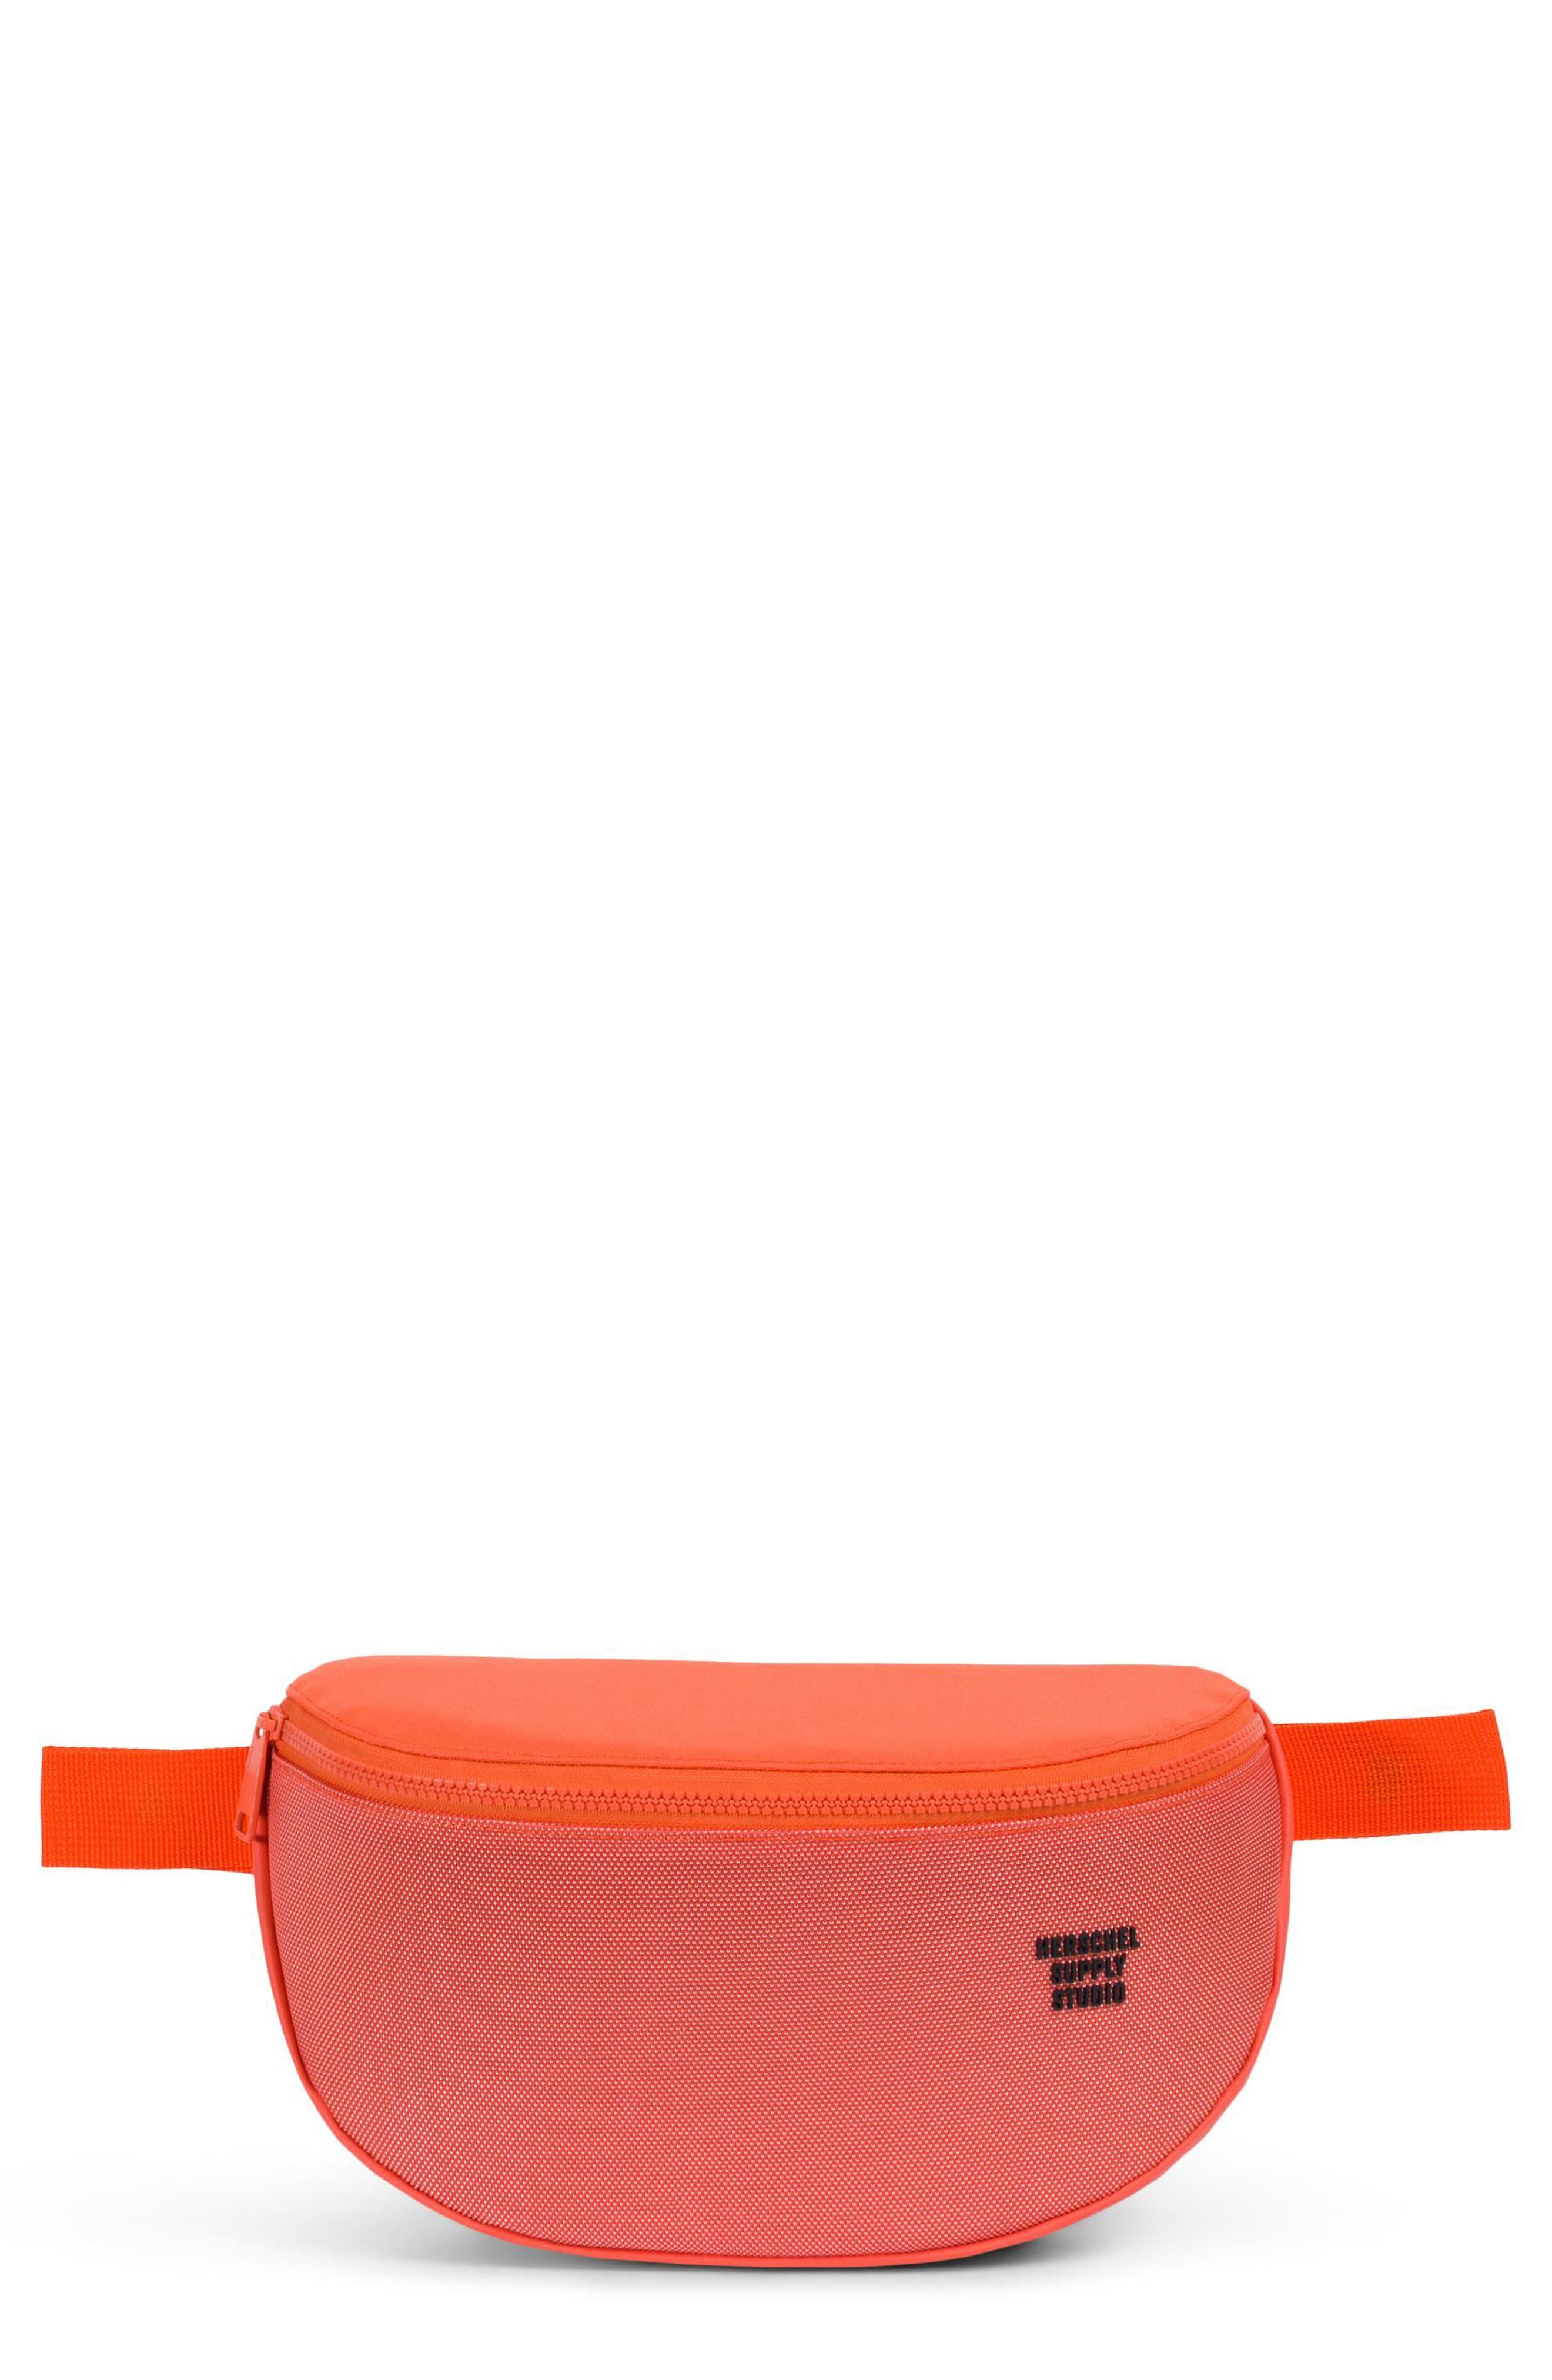 Sixteen Studio Belt Bag,                             Main thumbnail 1, color,                             Vermillion Orange